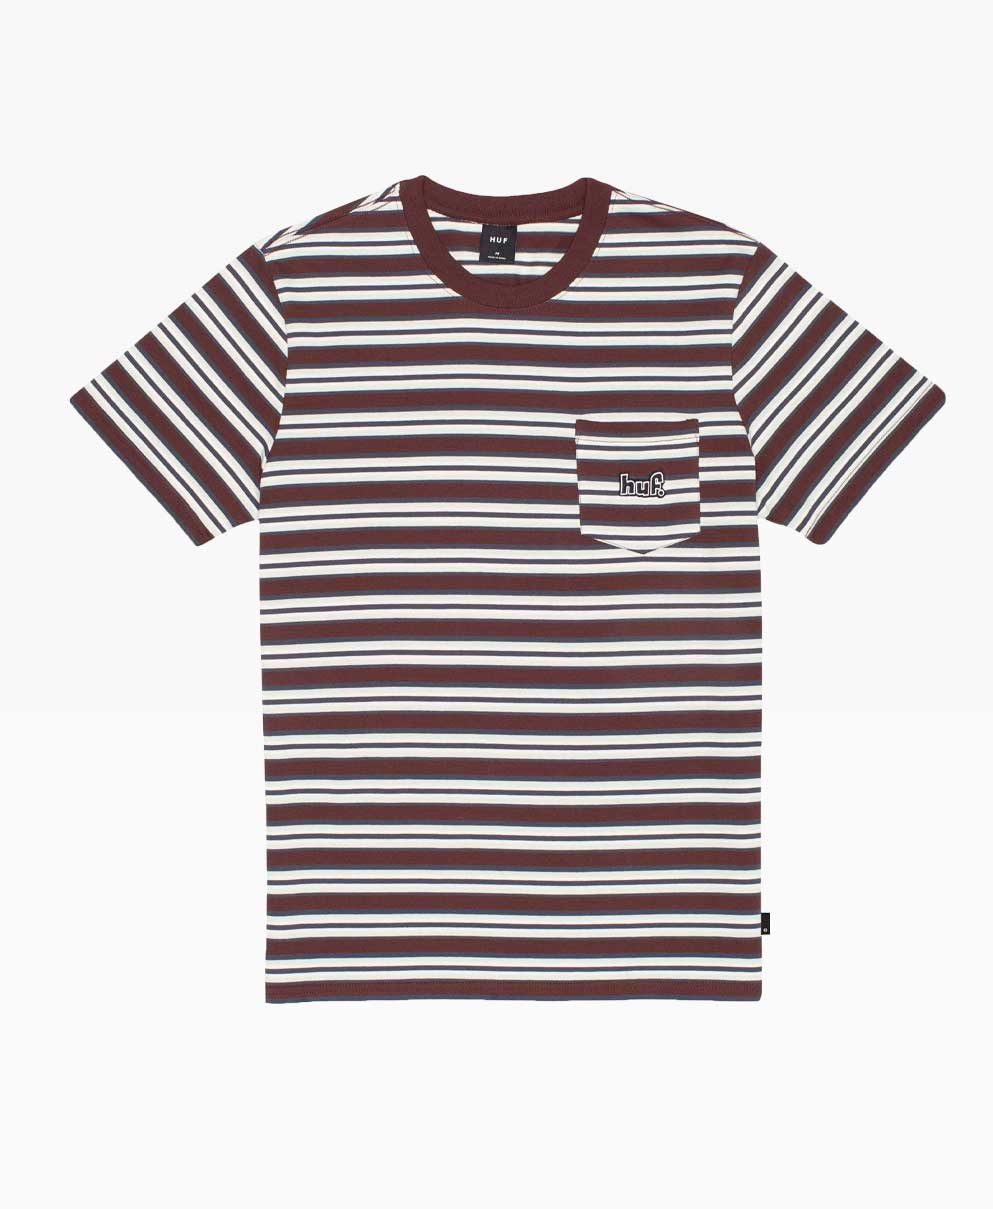 Huf Jett Stripe Short Sleeve Knit Top Front